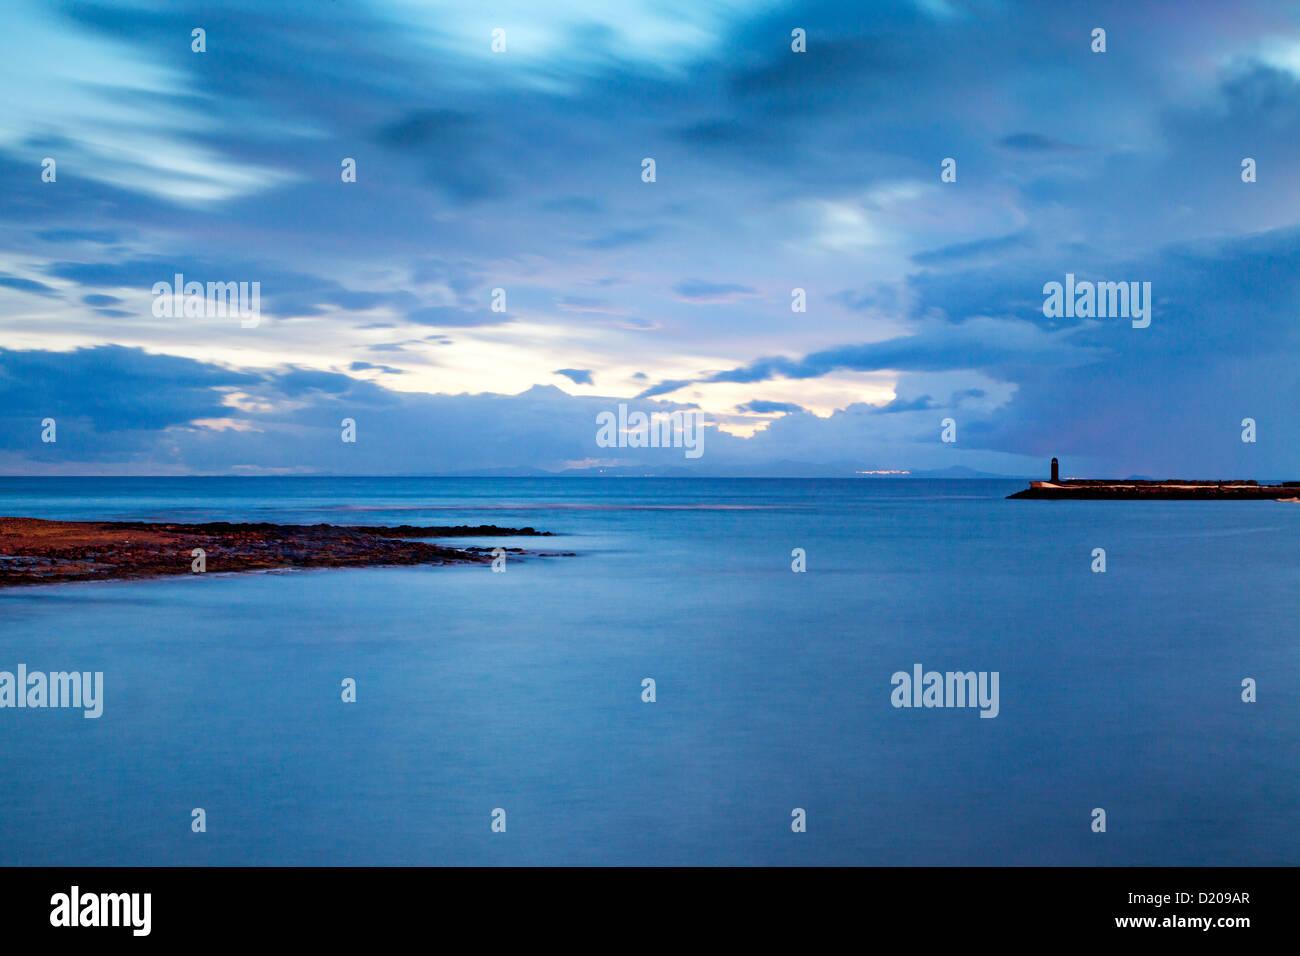 Sea at dusk, Arrecife, Lanzarote, Canary Islands, Spain, Europe - Stock Image